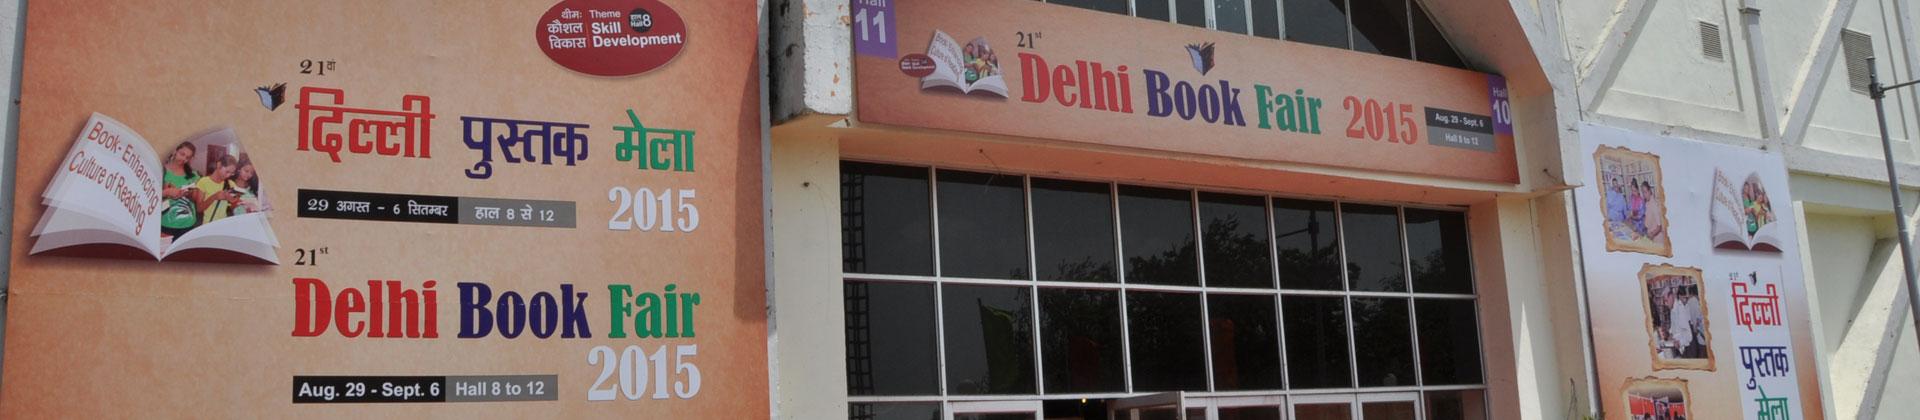 Itpo delhi book fair itpo slider image 01 gumiabroncs Image collections